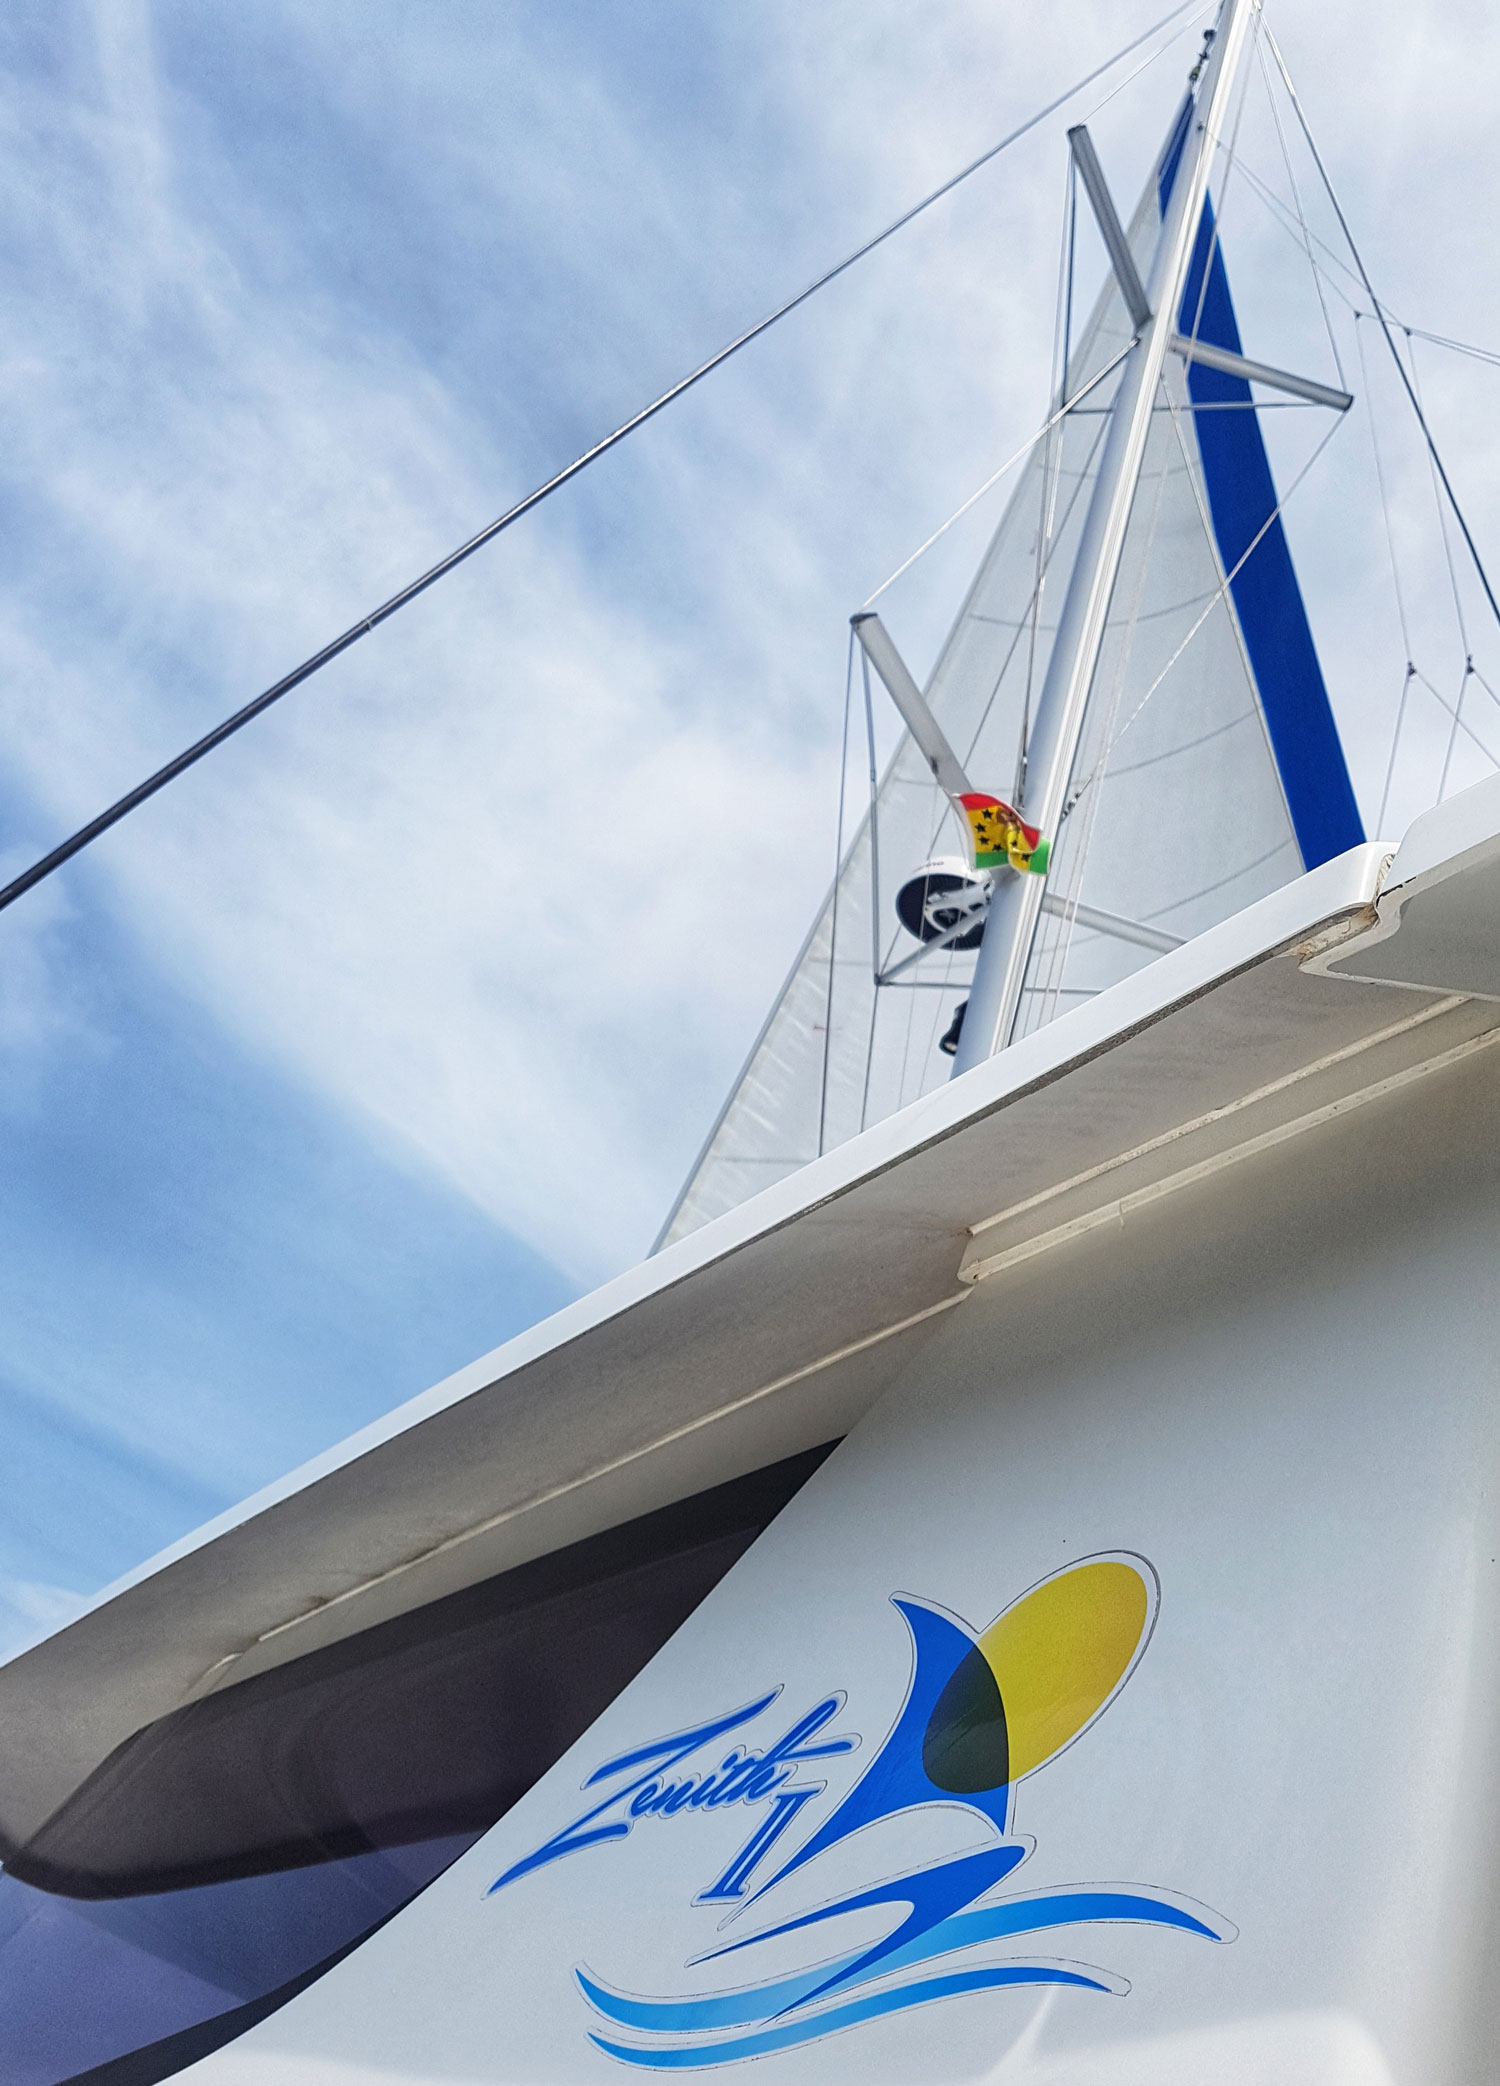 zenith-logo-plus-sail-claudiab.jpg